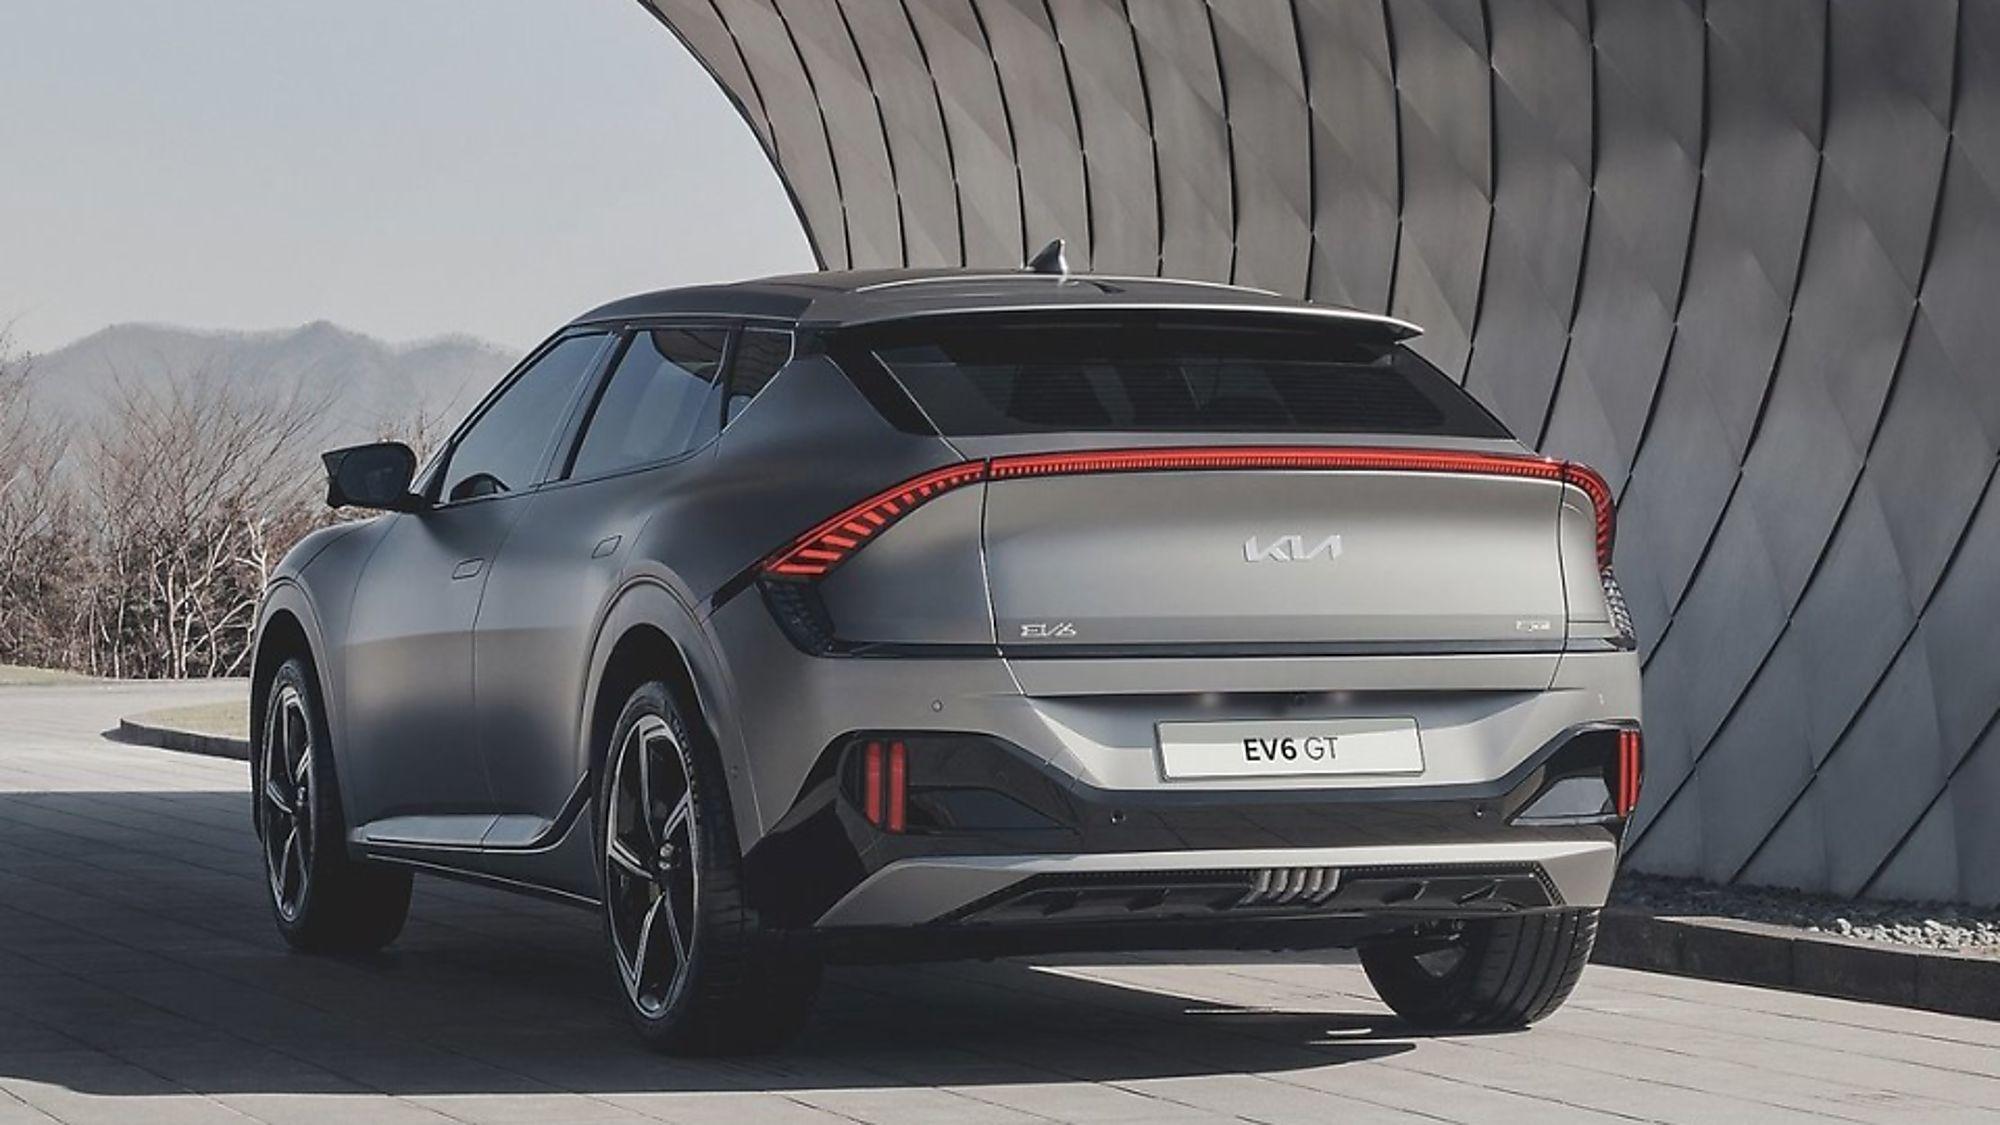 KIA: All-new EV6 electric car now on sale